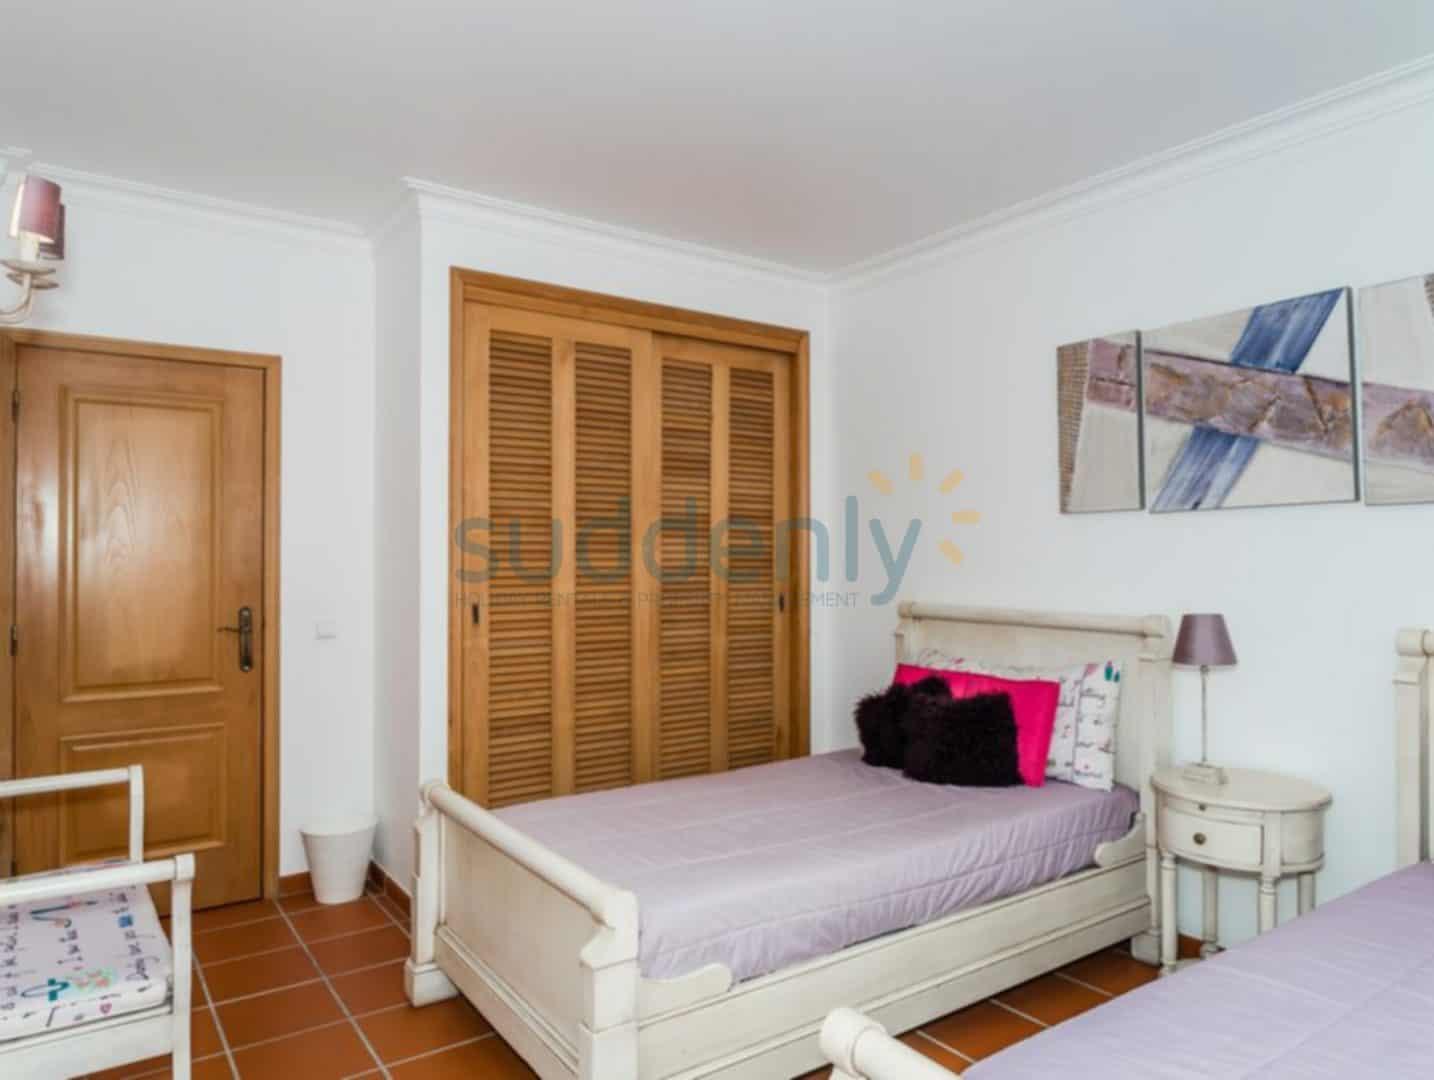 Villas 169